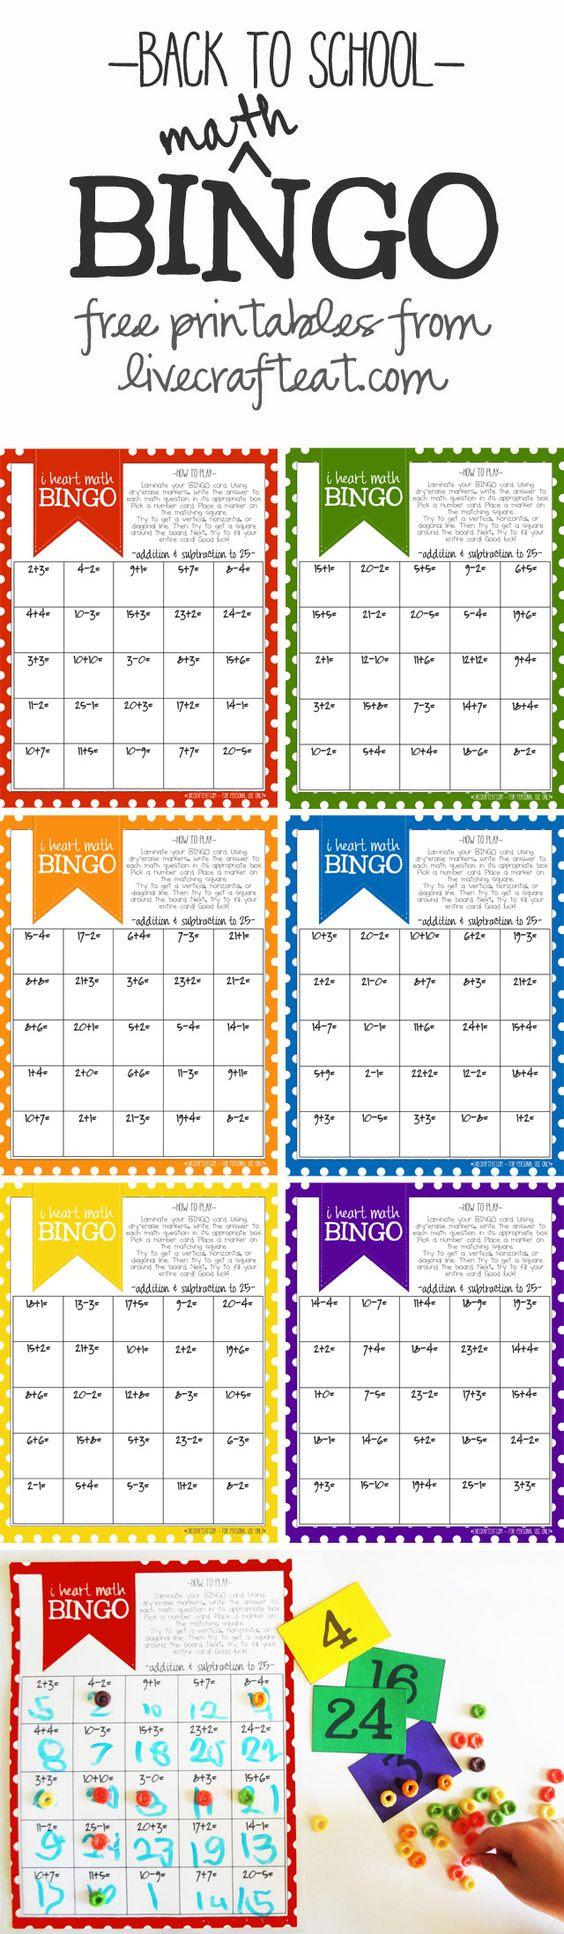 Math Bingo Printable For Kids - Free | For kids, Multiplication ...